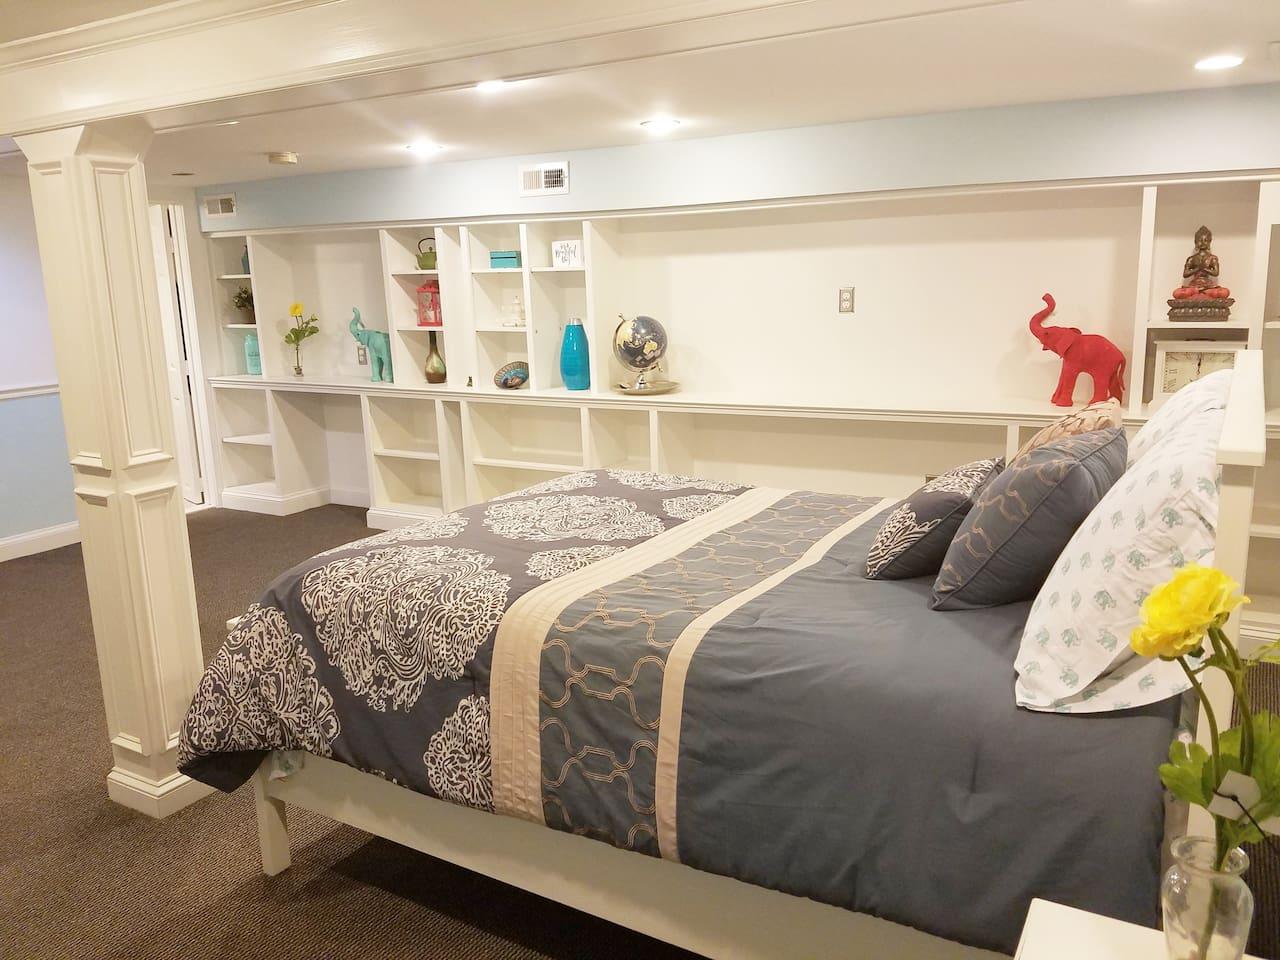 Spacious studio apartment with limitless storage!